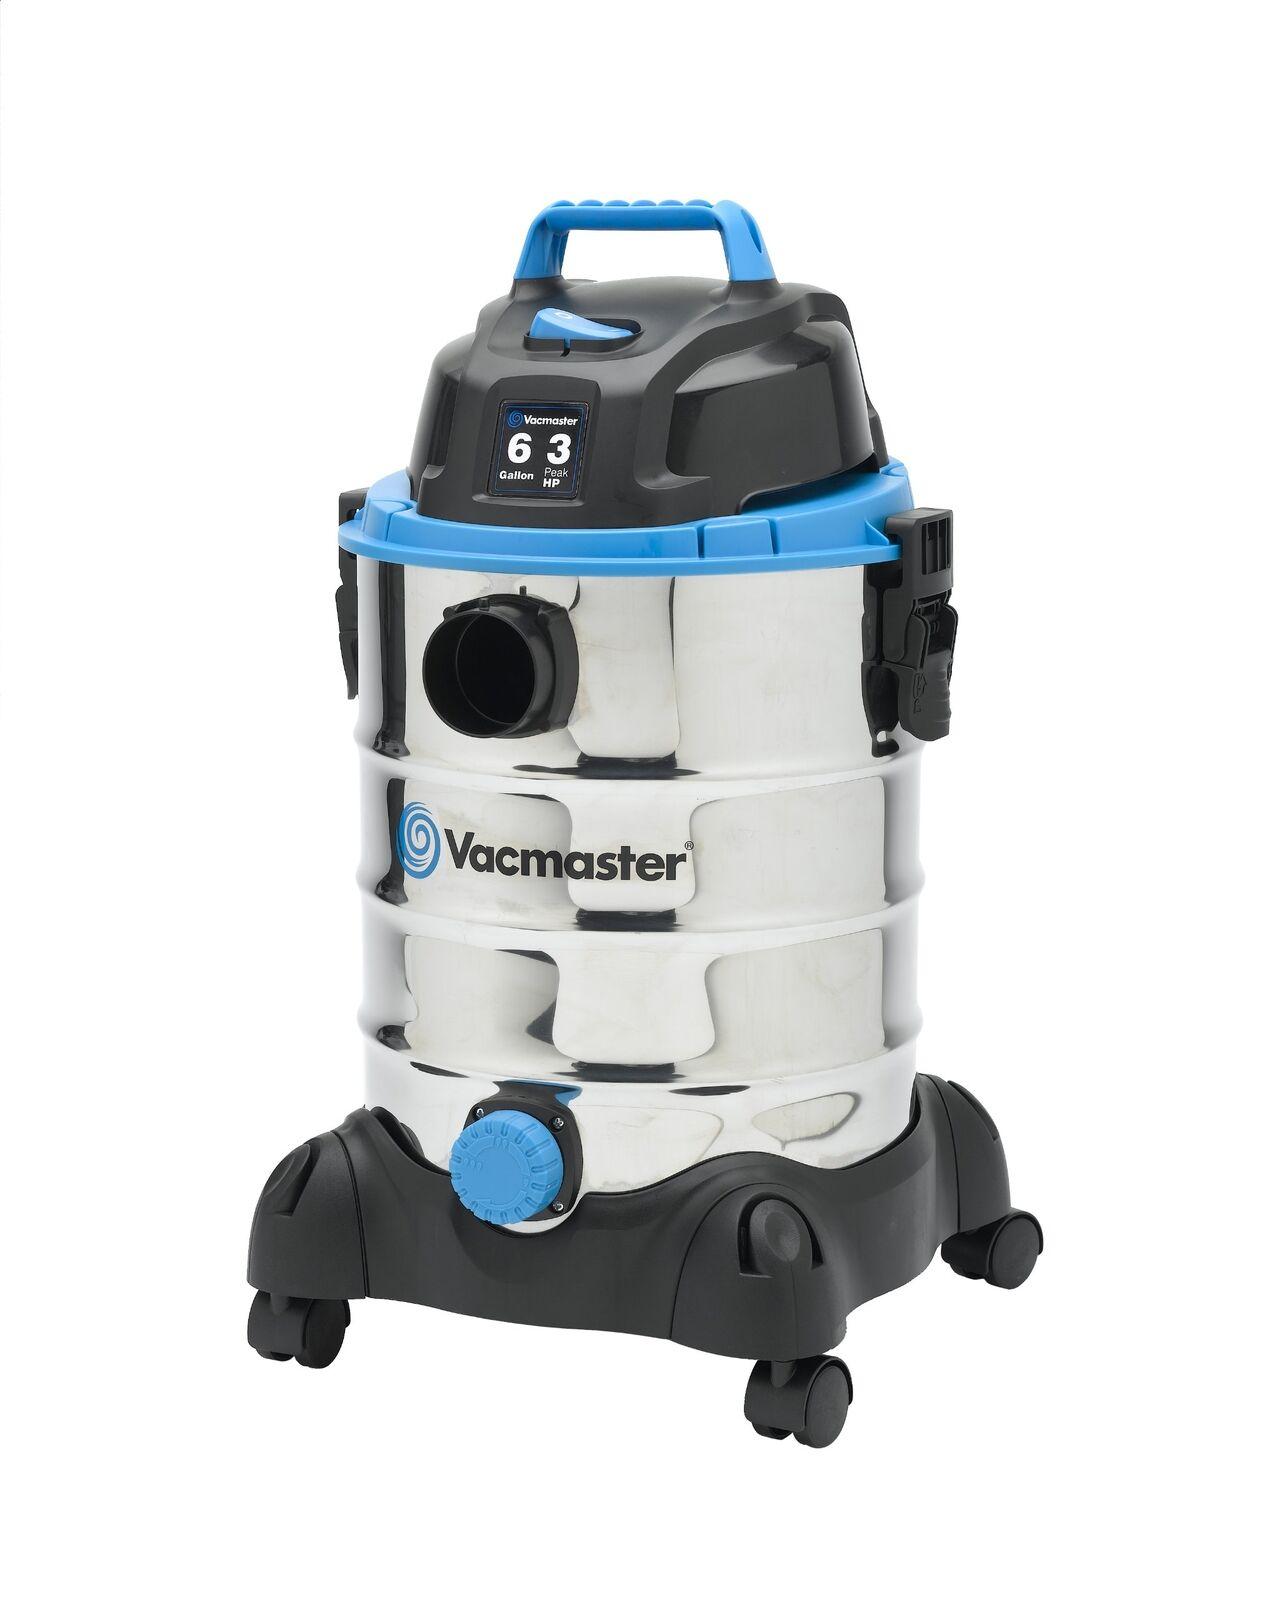 Vacmaster 6 Gallon 3 Peak HP Stainless Steel Wet Dry Vacuum VQ607SFD